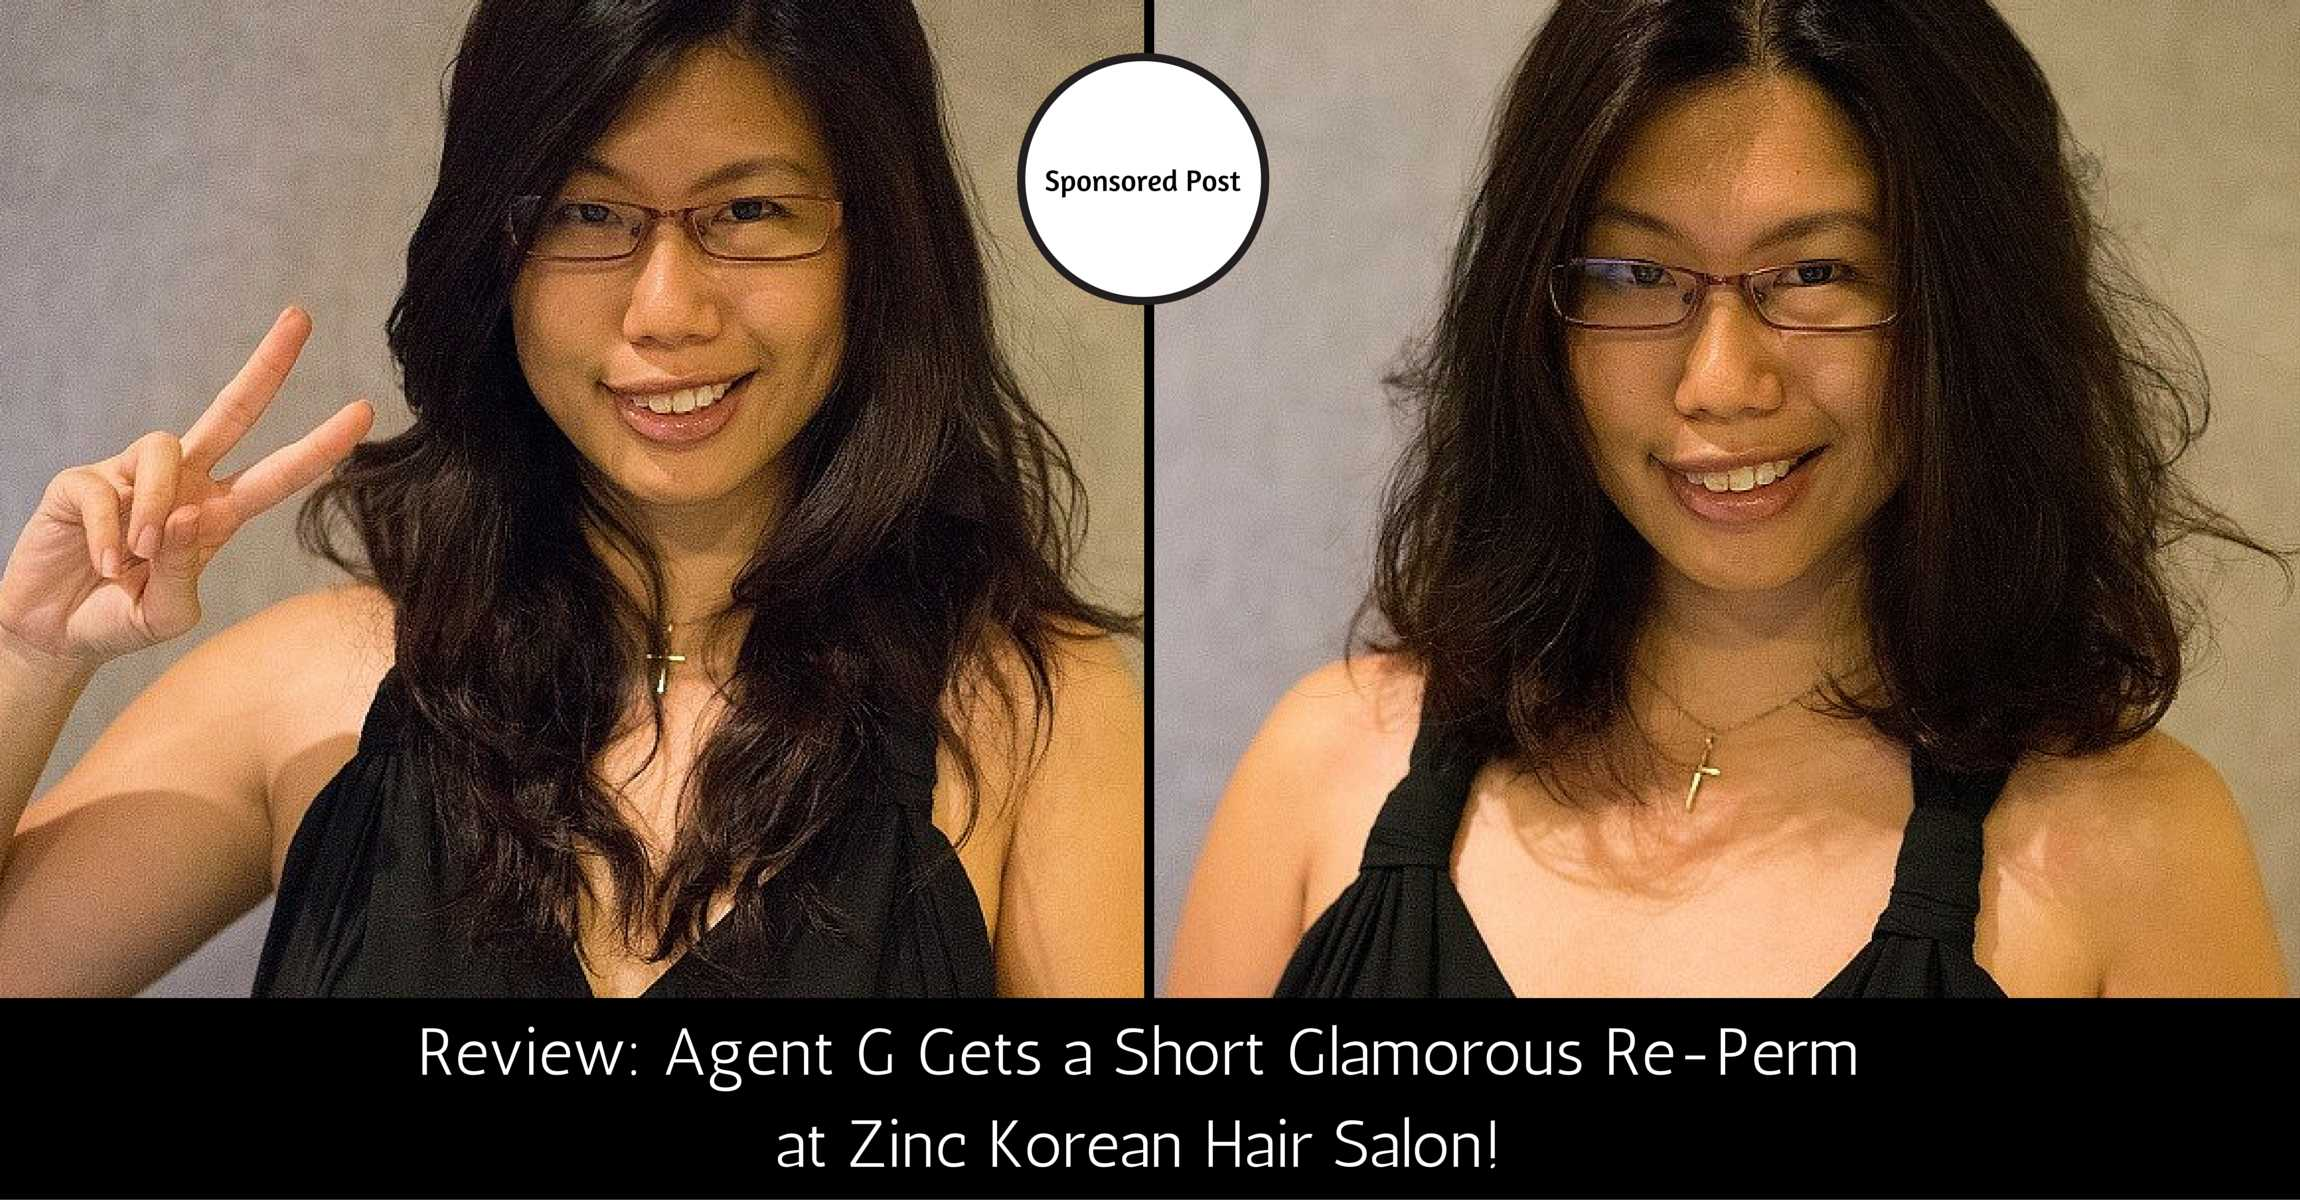 Straight perm procedure - Glamor Re Reperm At Zinc Korean Hair Salon